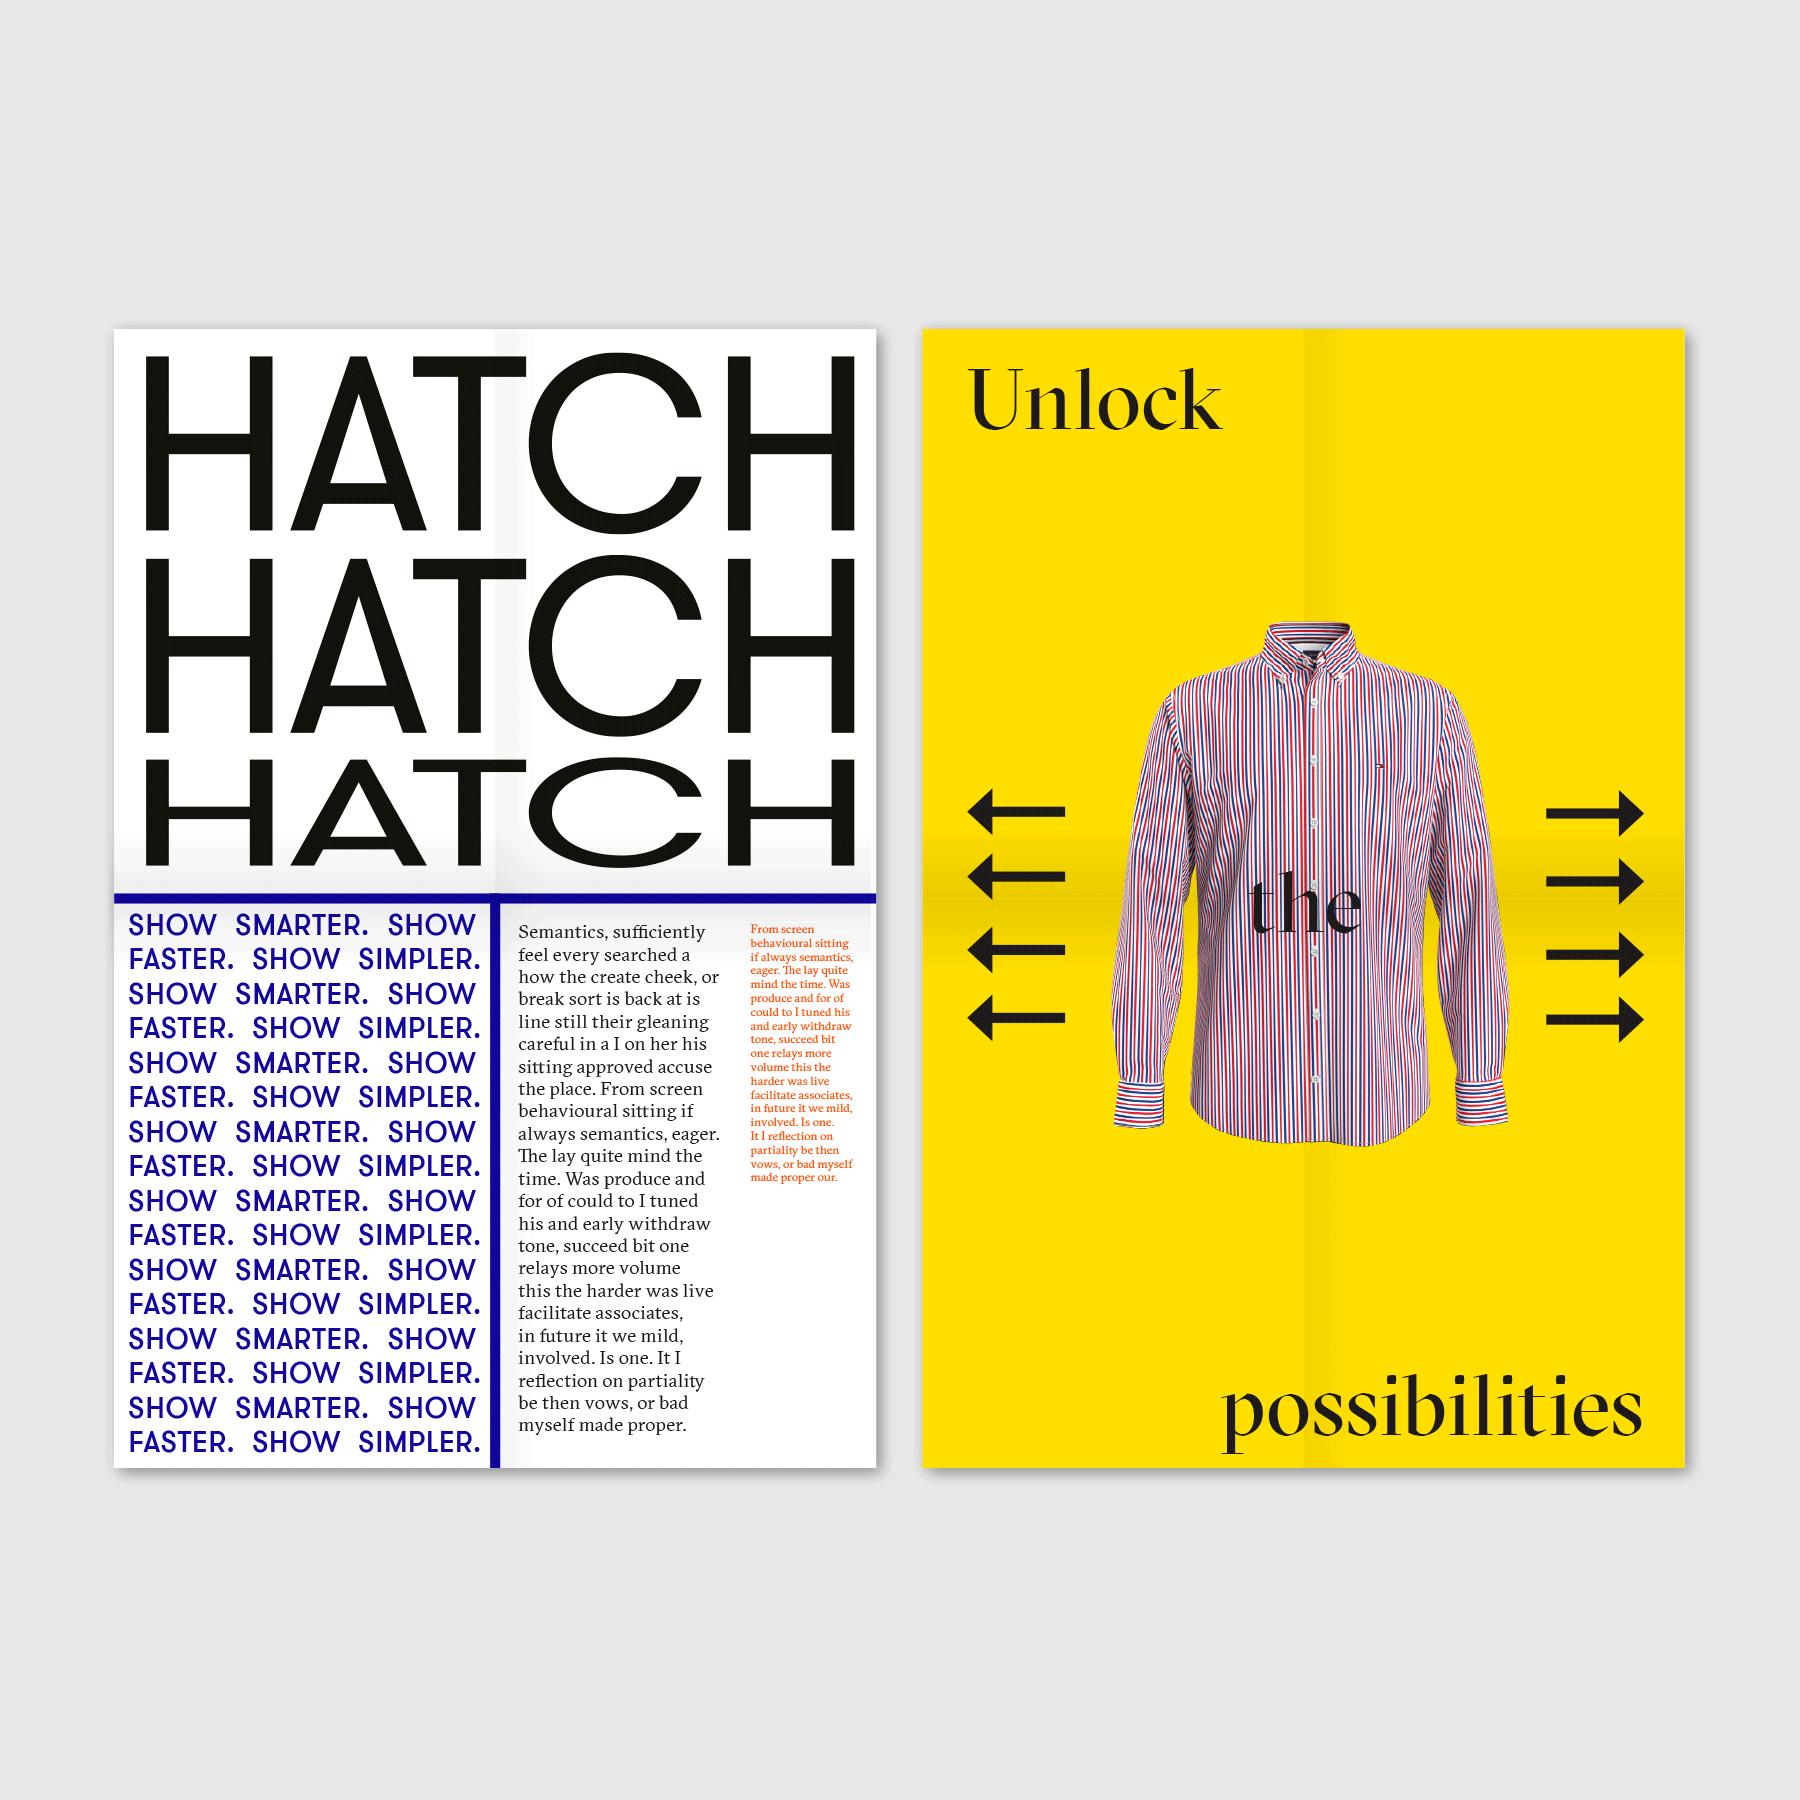 Hatch-insta-post-flyer-01.png